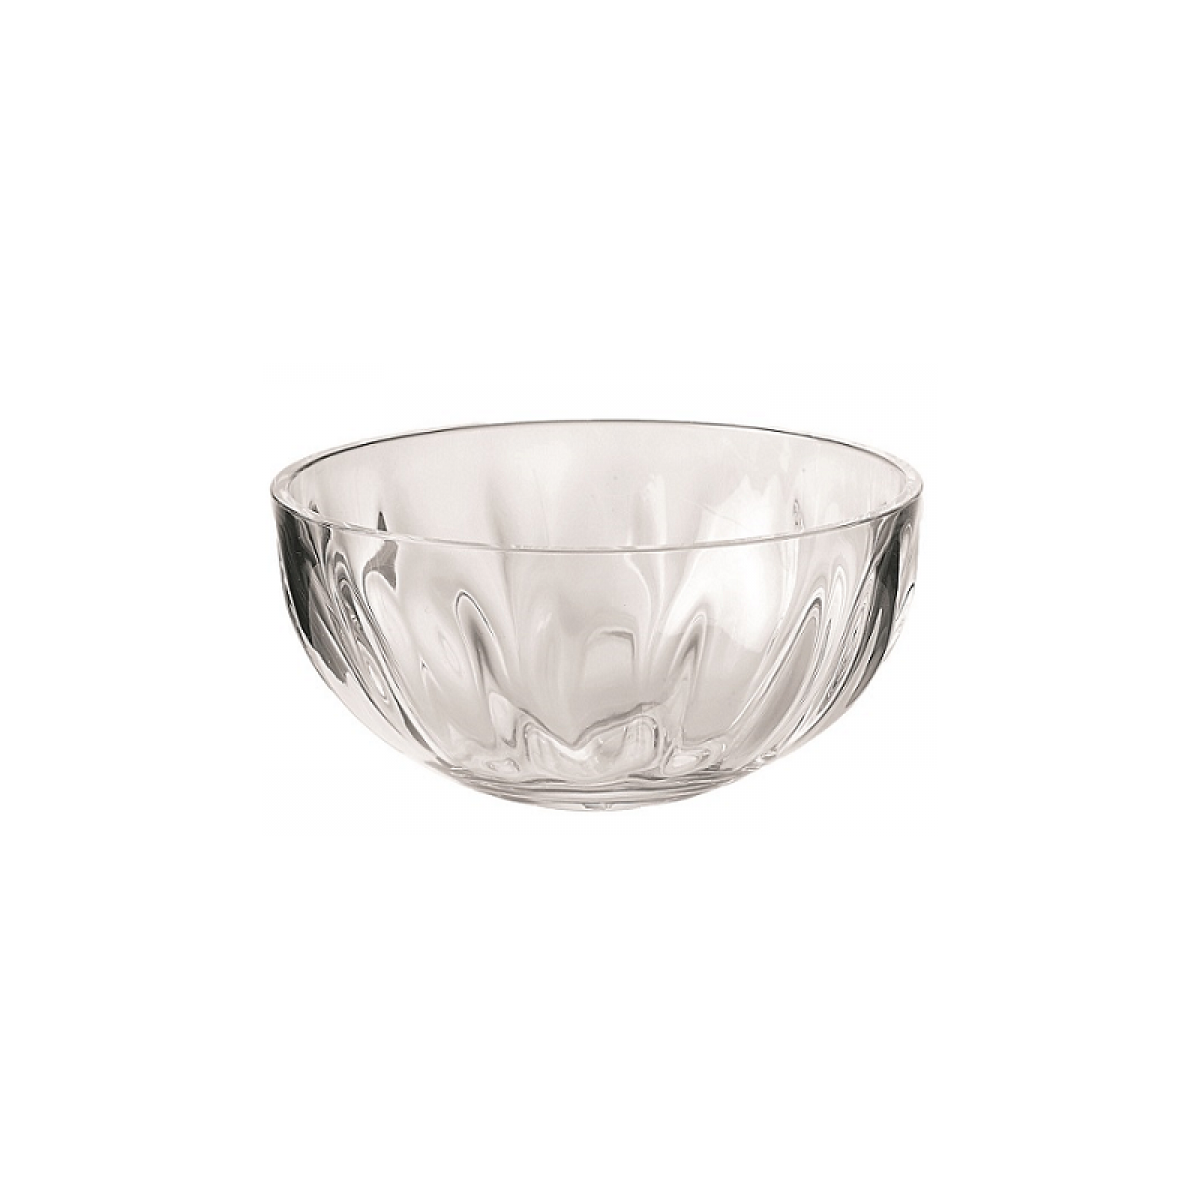 Guzzini Saladier 30 cm - Guzzini - Transparent aspect verre soufflé